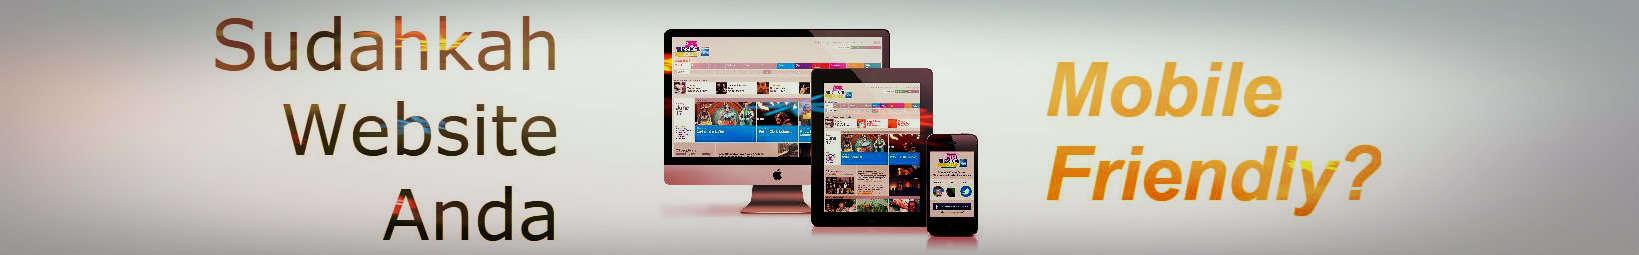 jasa bikin website mobile friendly di Jakarta